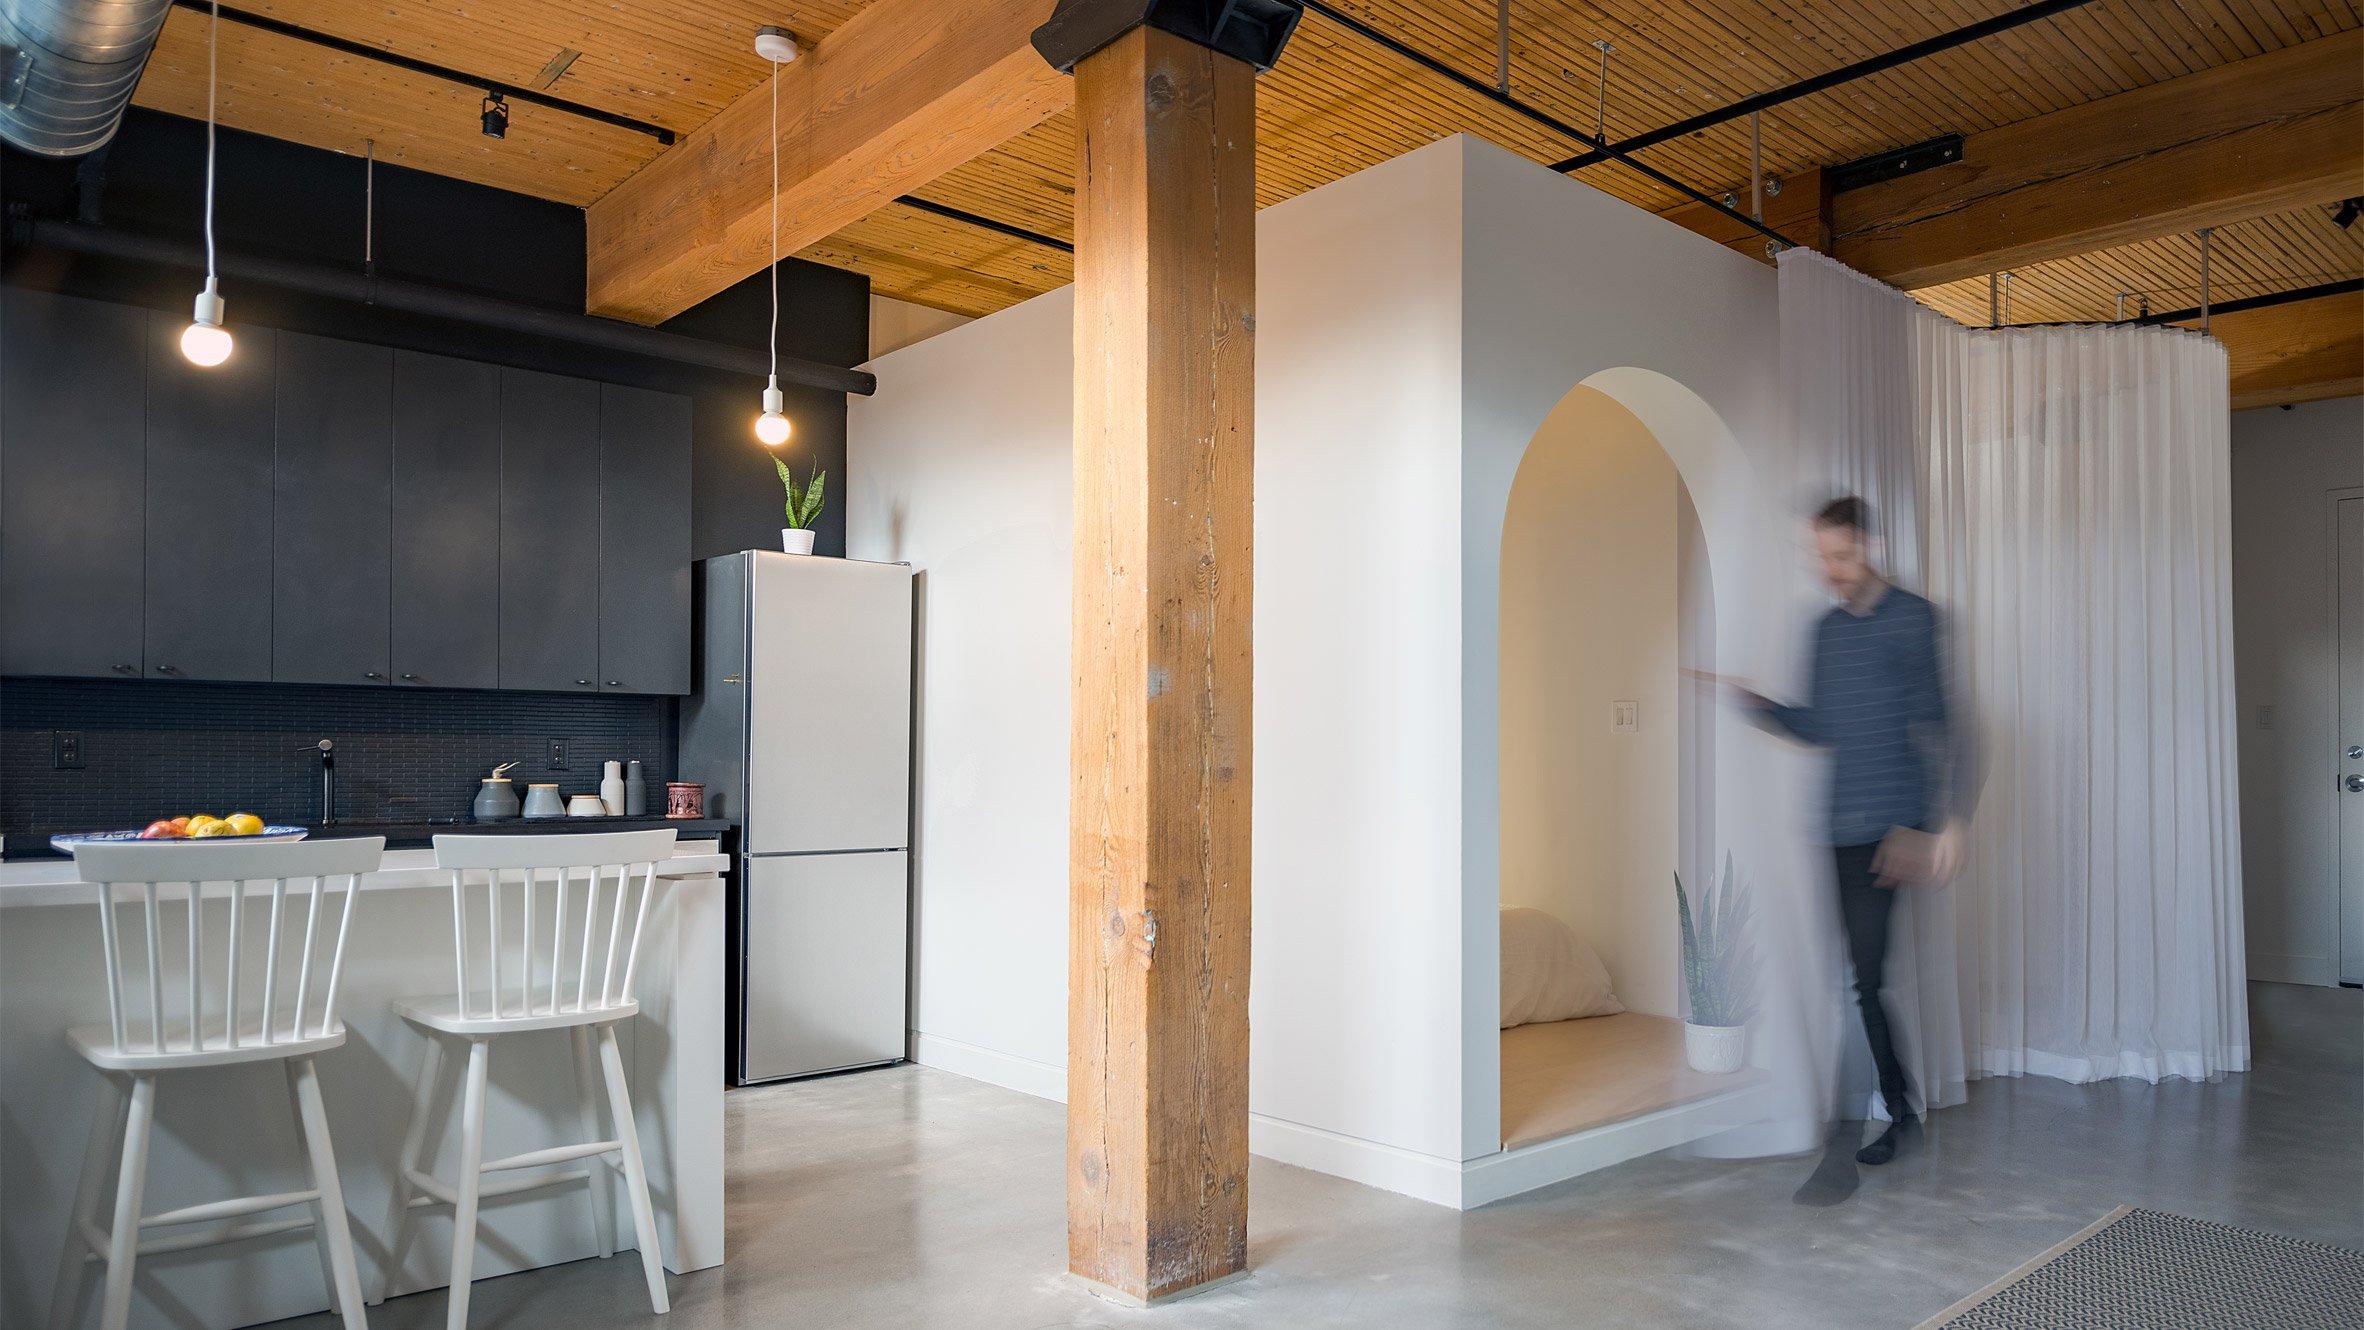 studioac StudioAC Redesigns Local Apartment With Minimal Sleeping Box StudioAC Redesigns Local Apartment With Minimal Sleeping Box 7